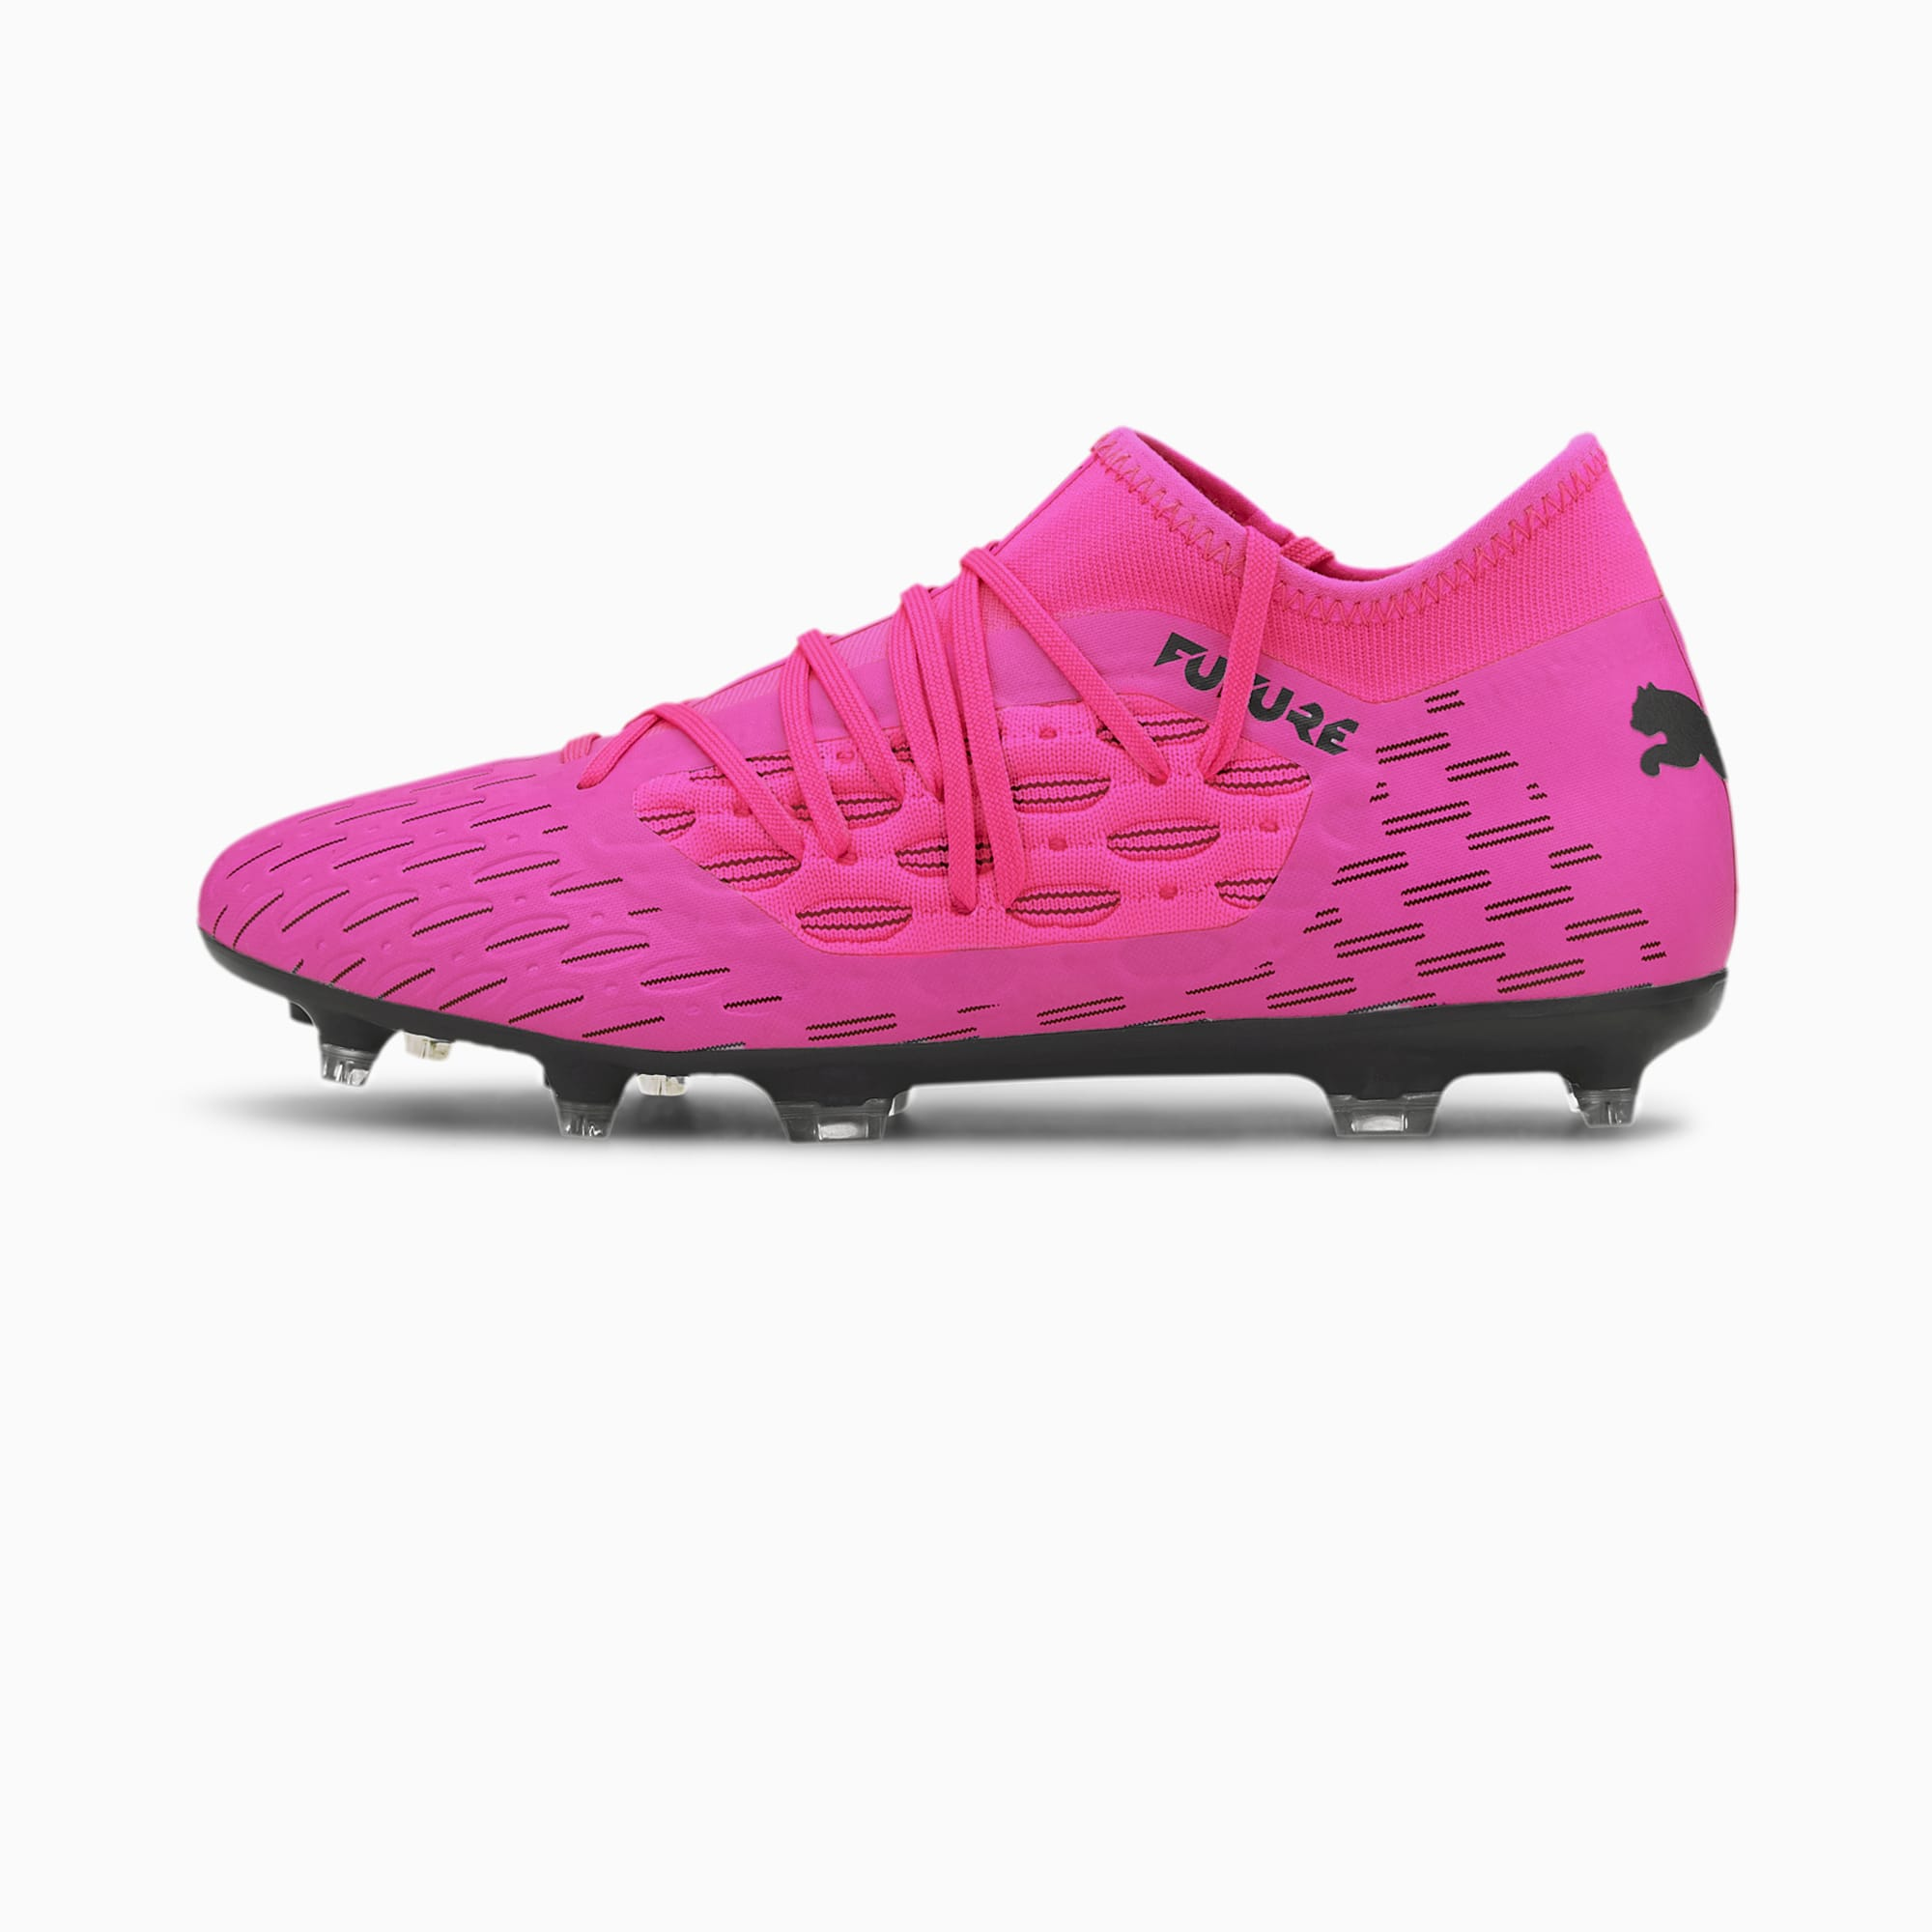 Future 6.3 NETFIT FG/AG Men's Football Boots